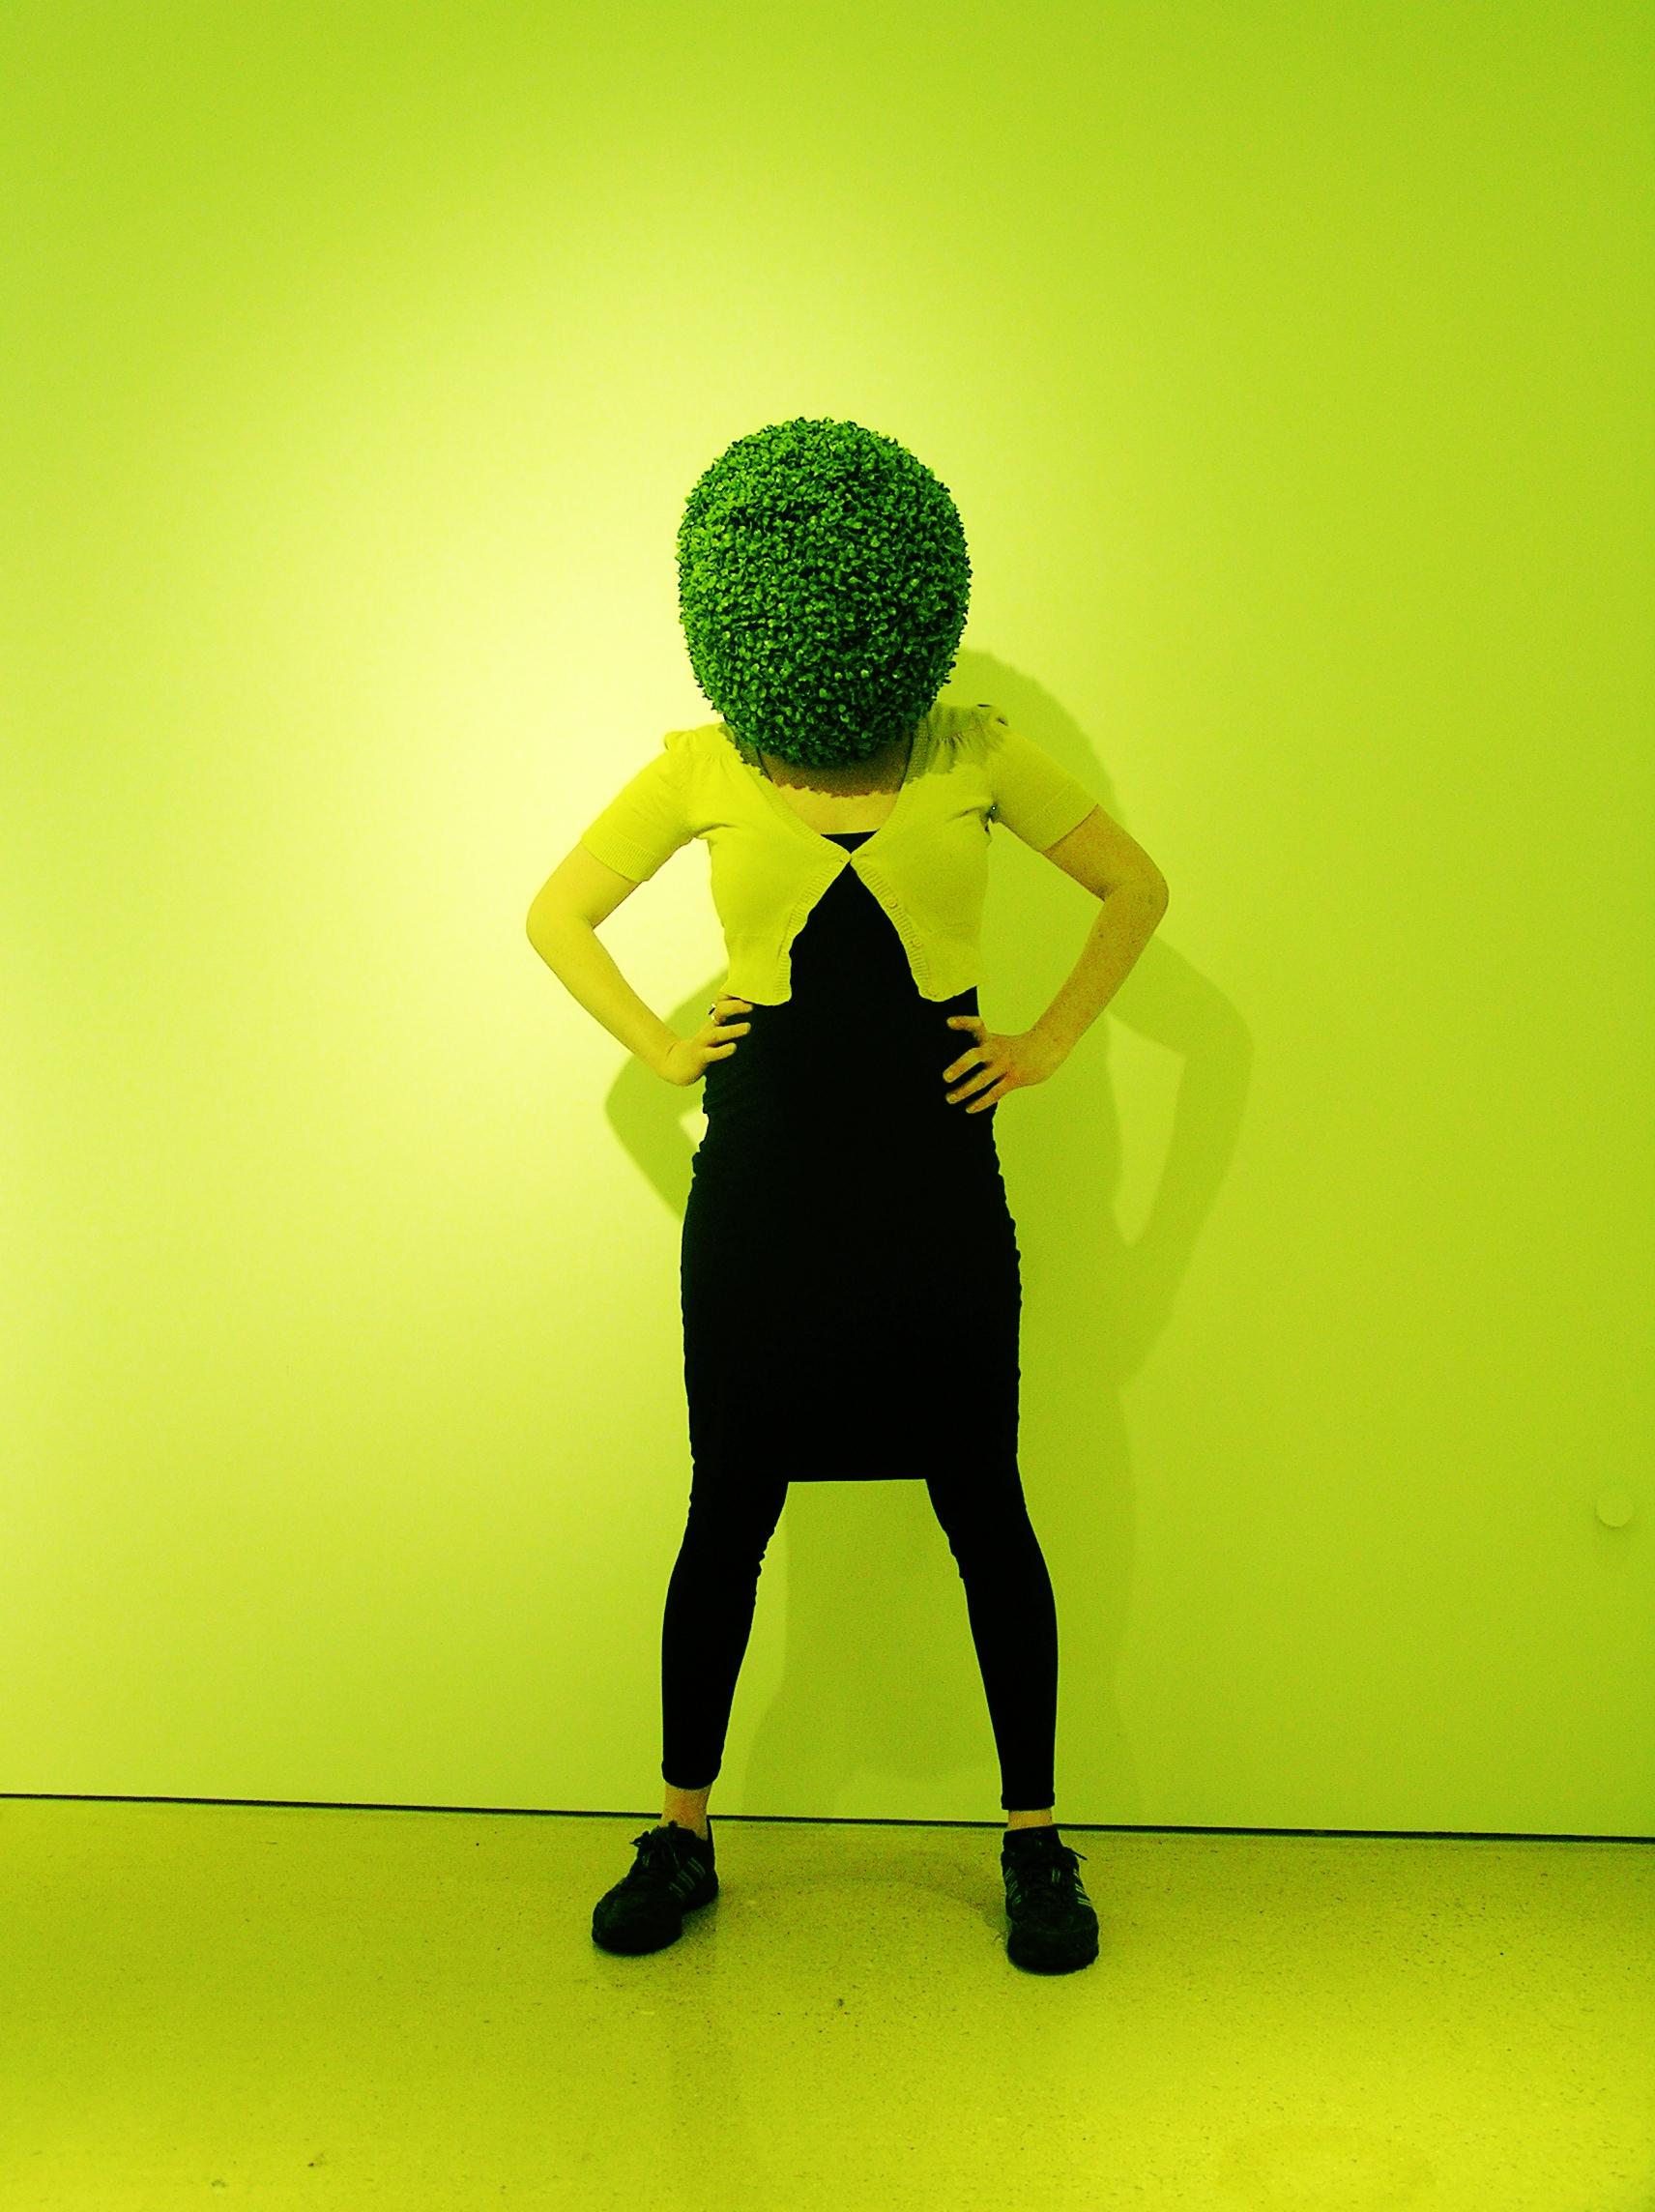 Bush head